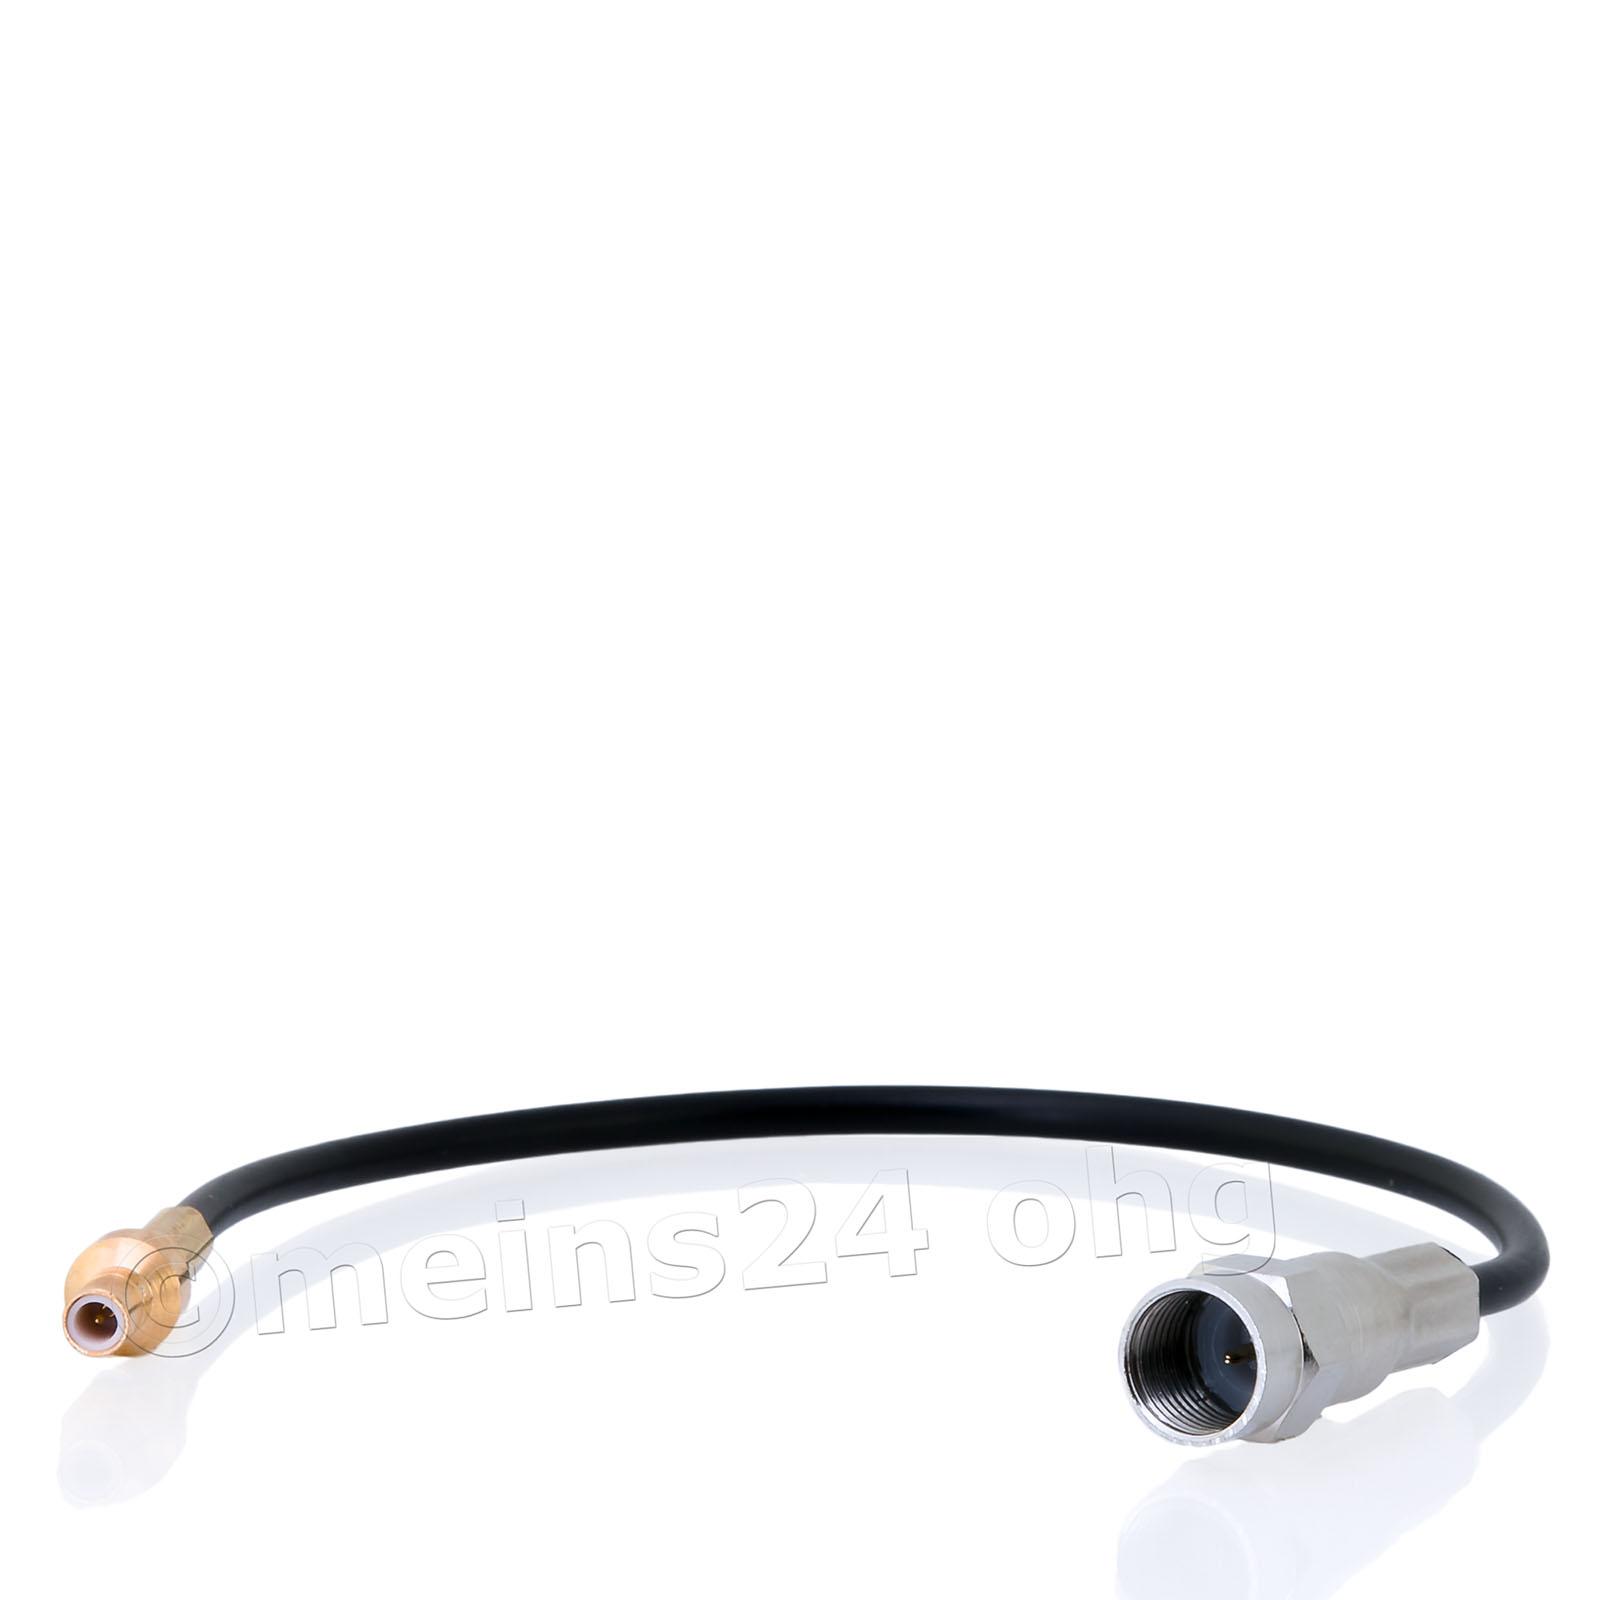 Antennenadapter FME Stecker (m) > SMB Stecker (m)